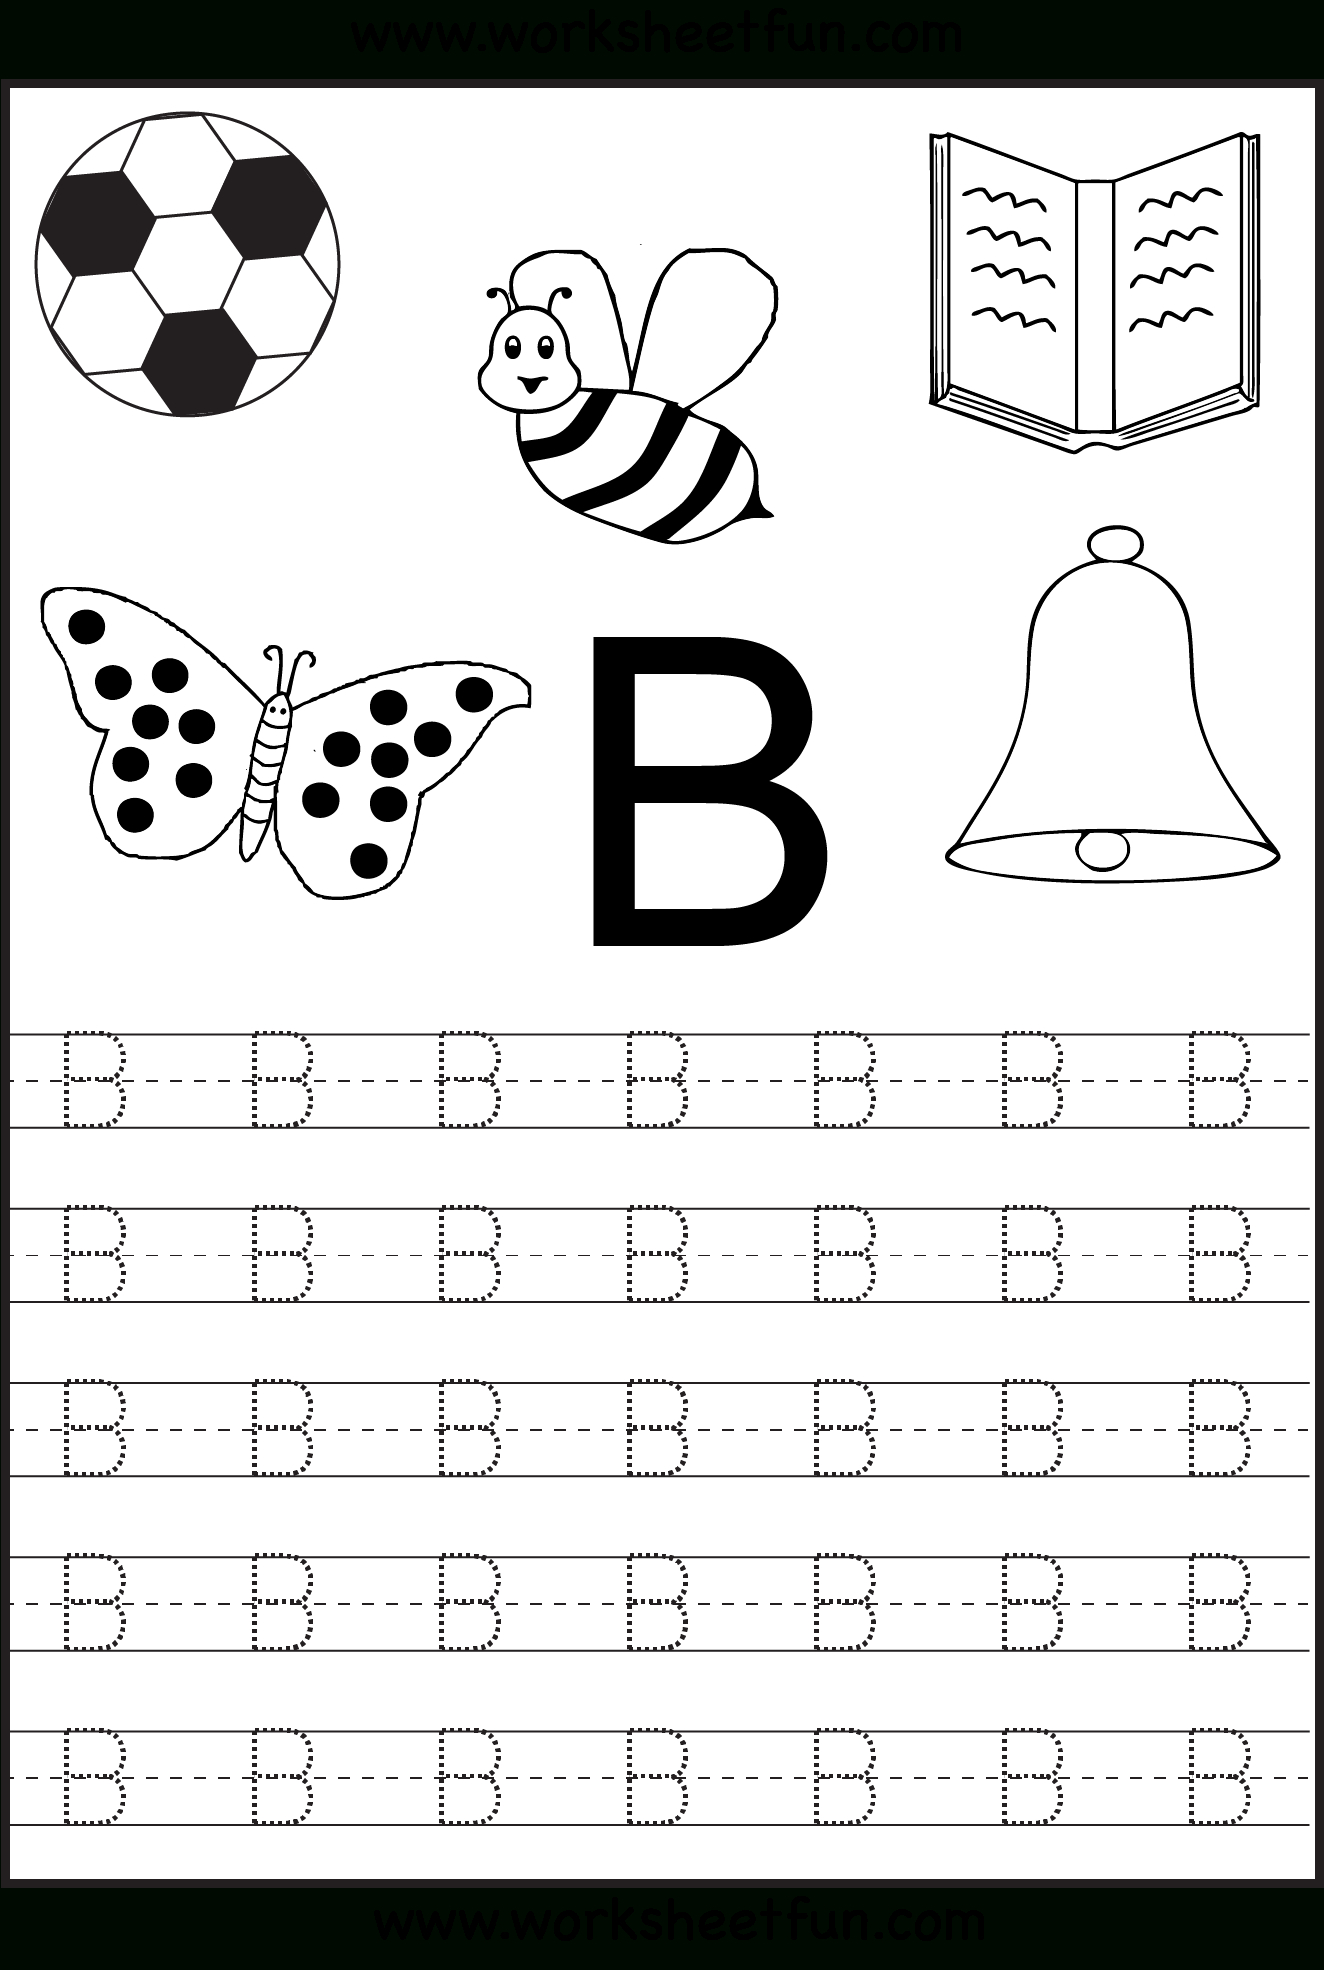 Free Printable Letter Tracing Worksheets For Kindergarten – 26 | Free Printable Tracing Letters And Numbers Worksheets